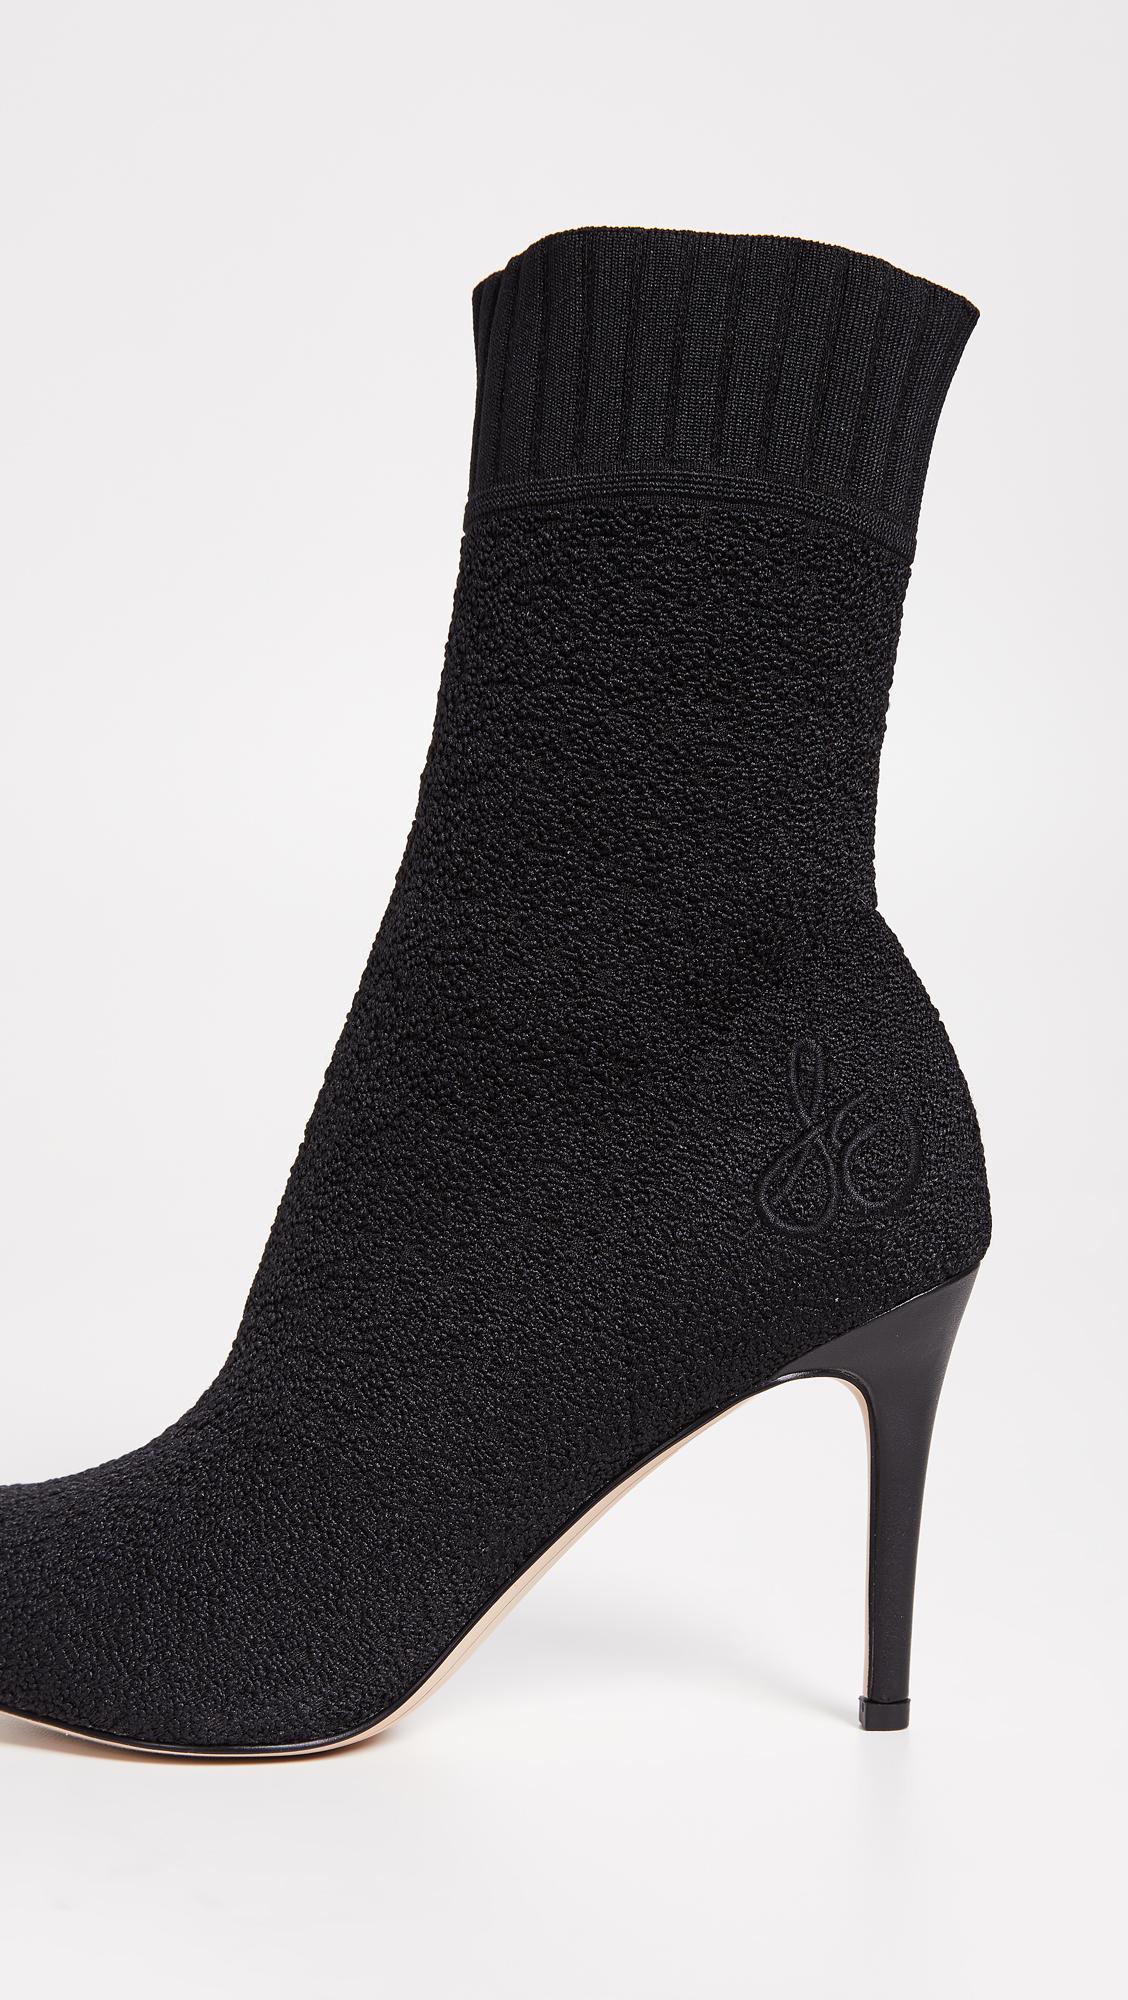 64d2df94a Sam Edelman Oksana Sock Booties